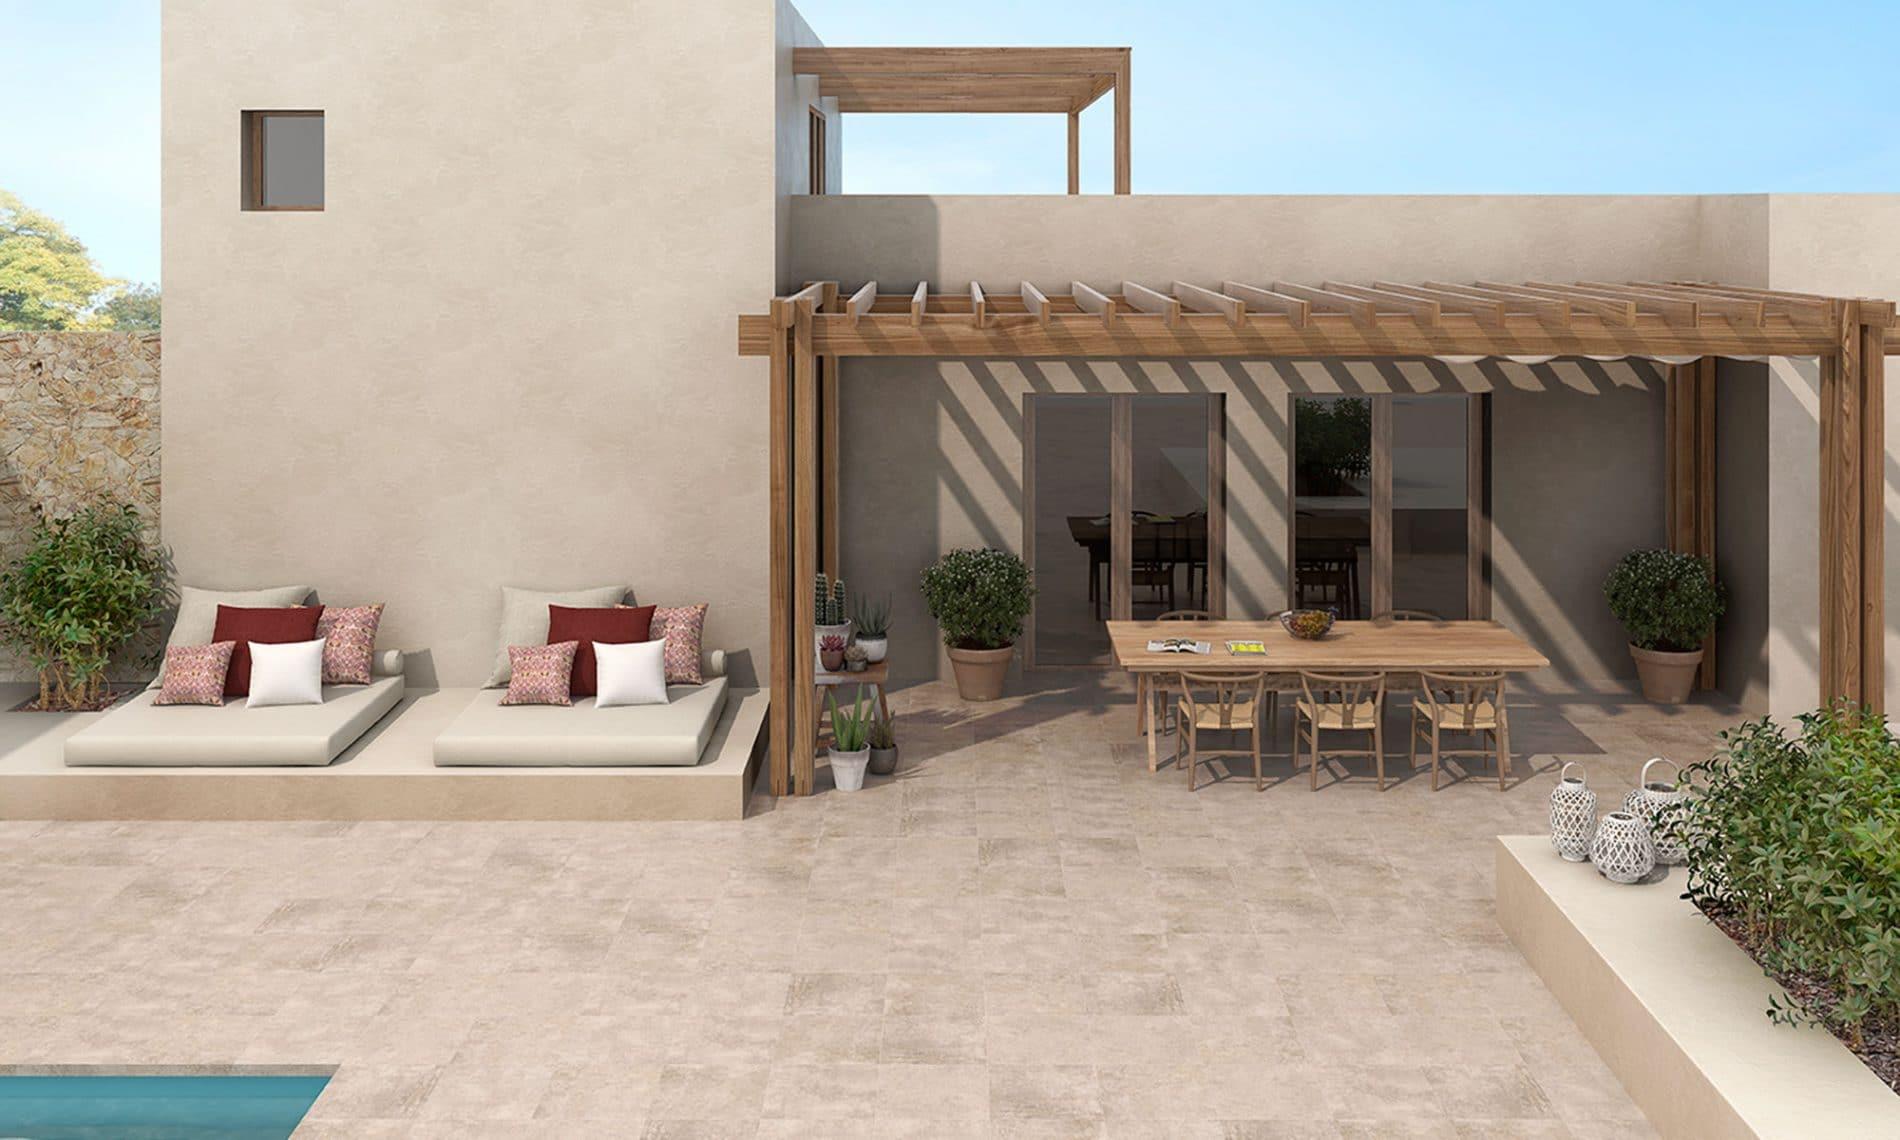 Ext rieur terrasse piscine balcon david carrelage for Carrelage terrasse exterieur porcelanosa